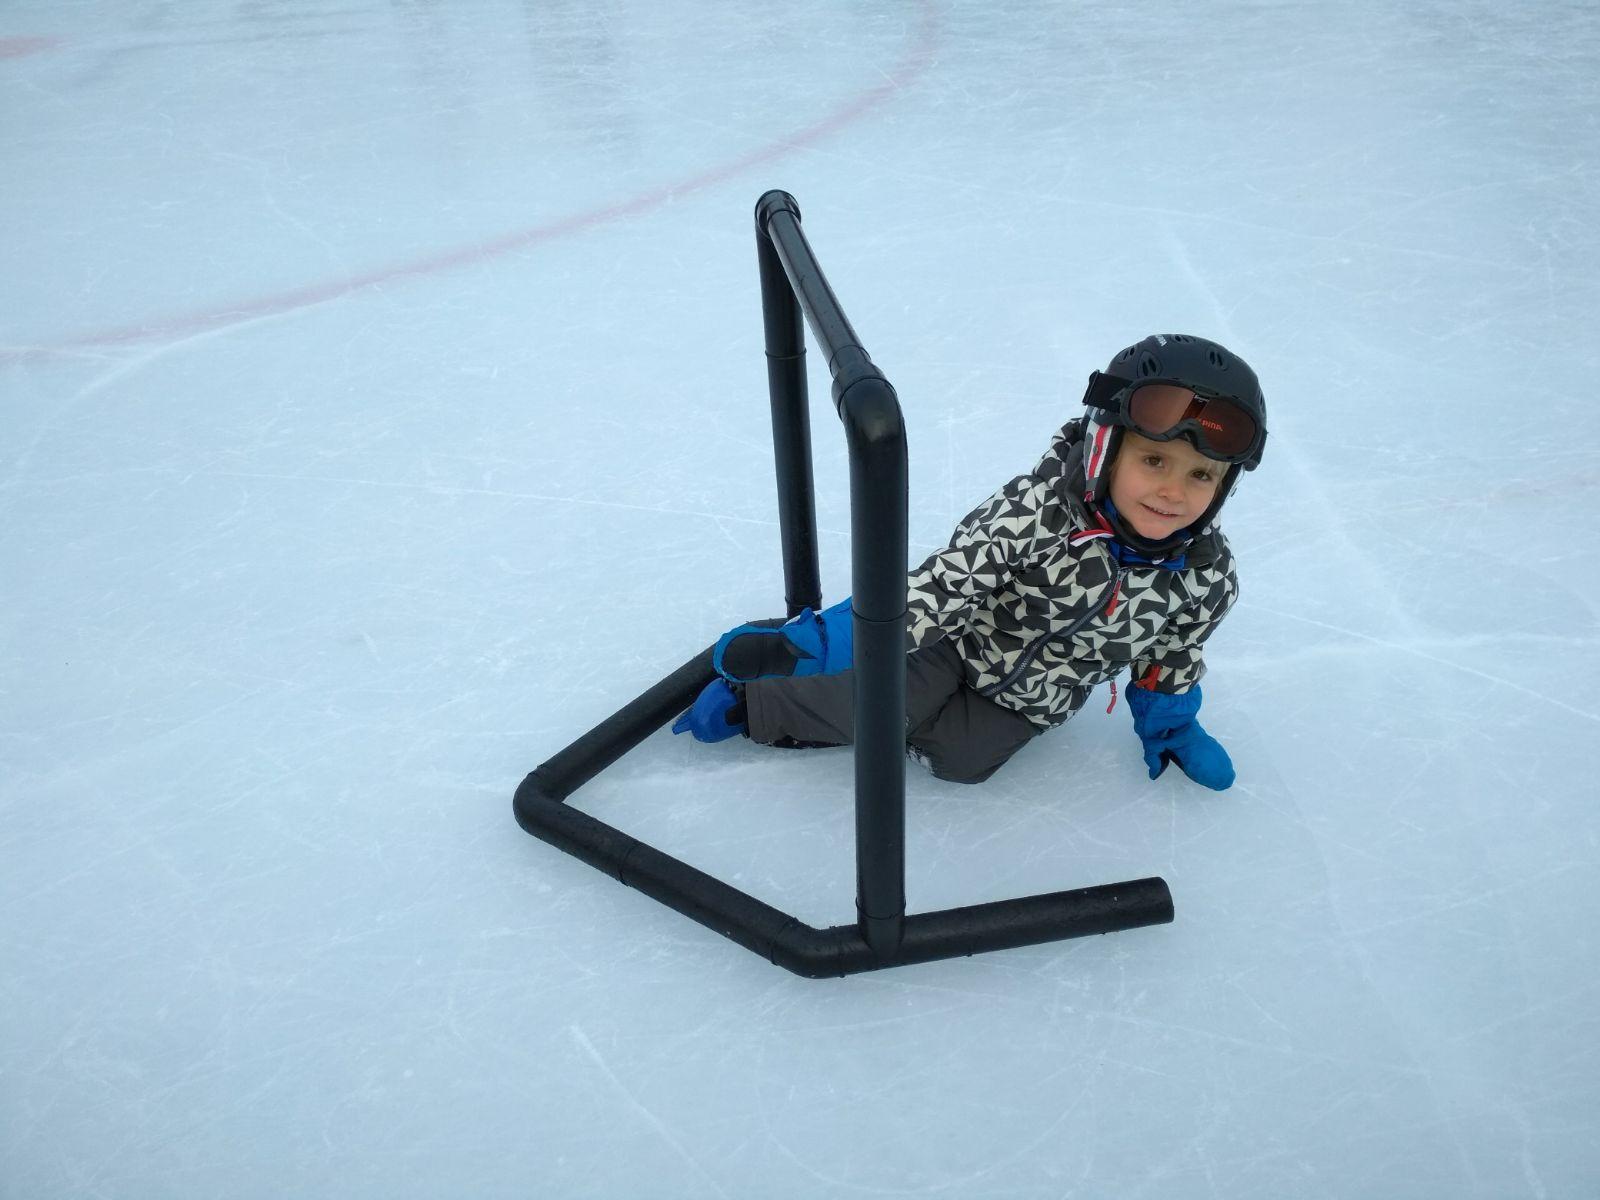 Eislaufen Henry reaga.jpg